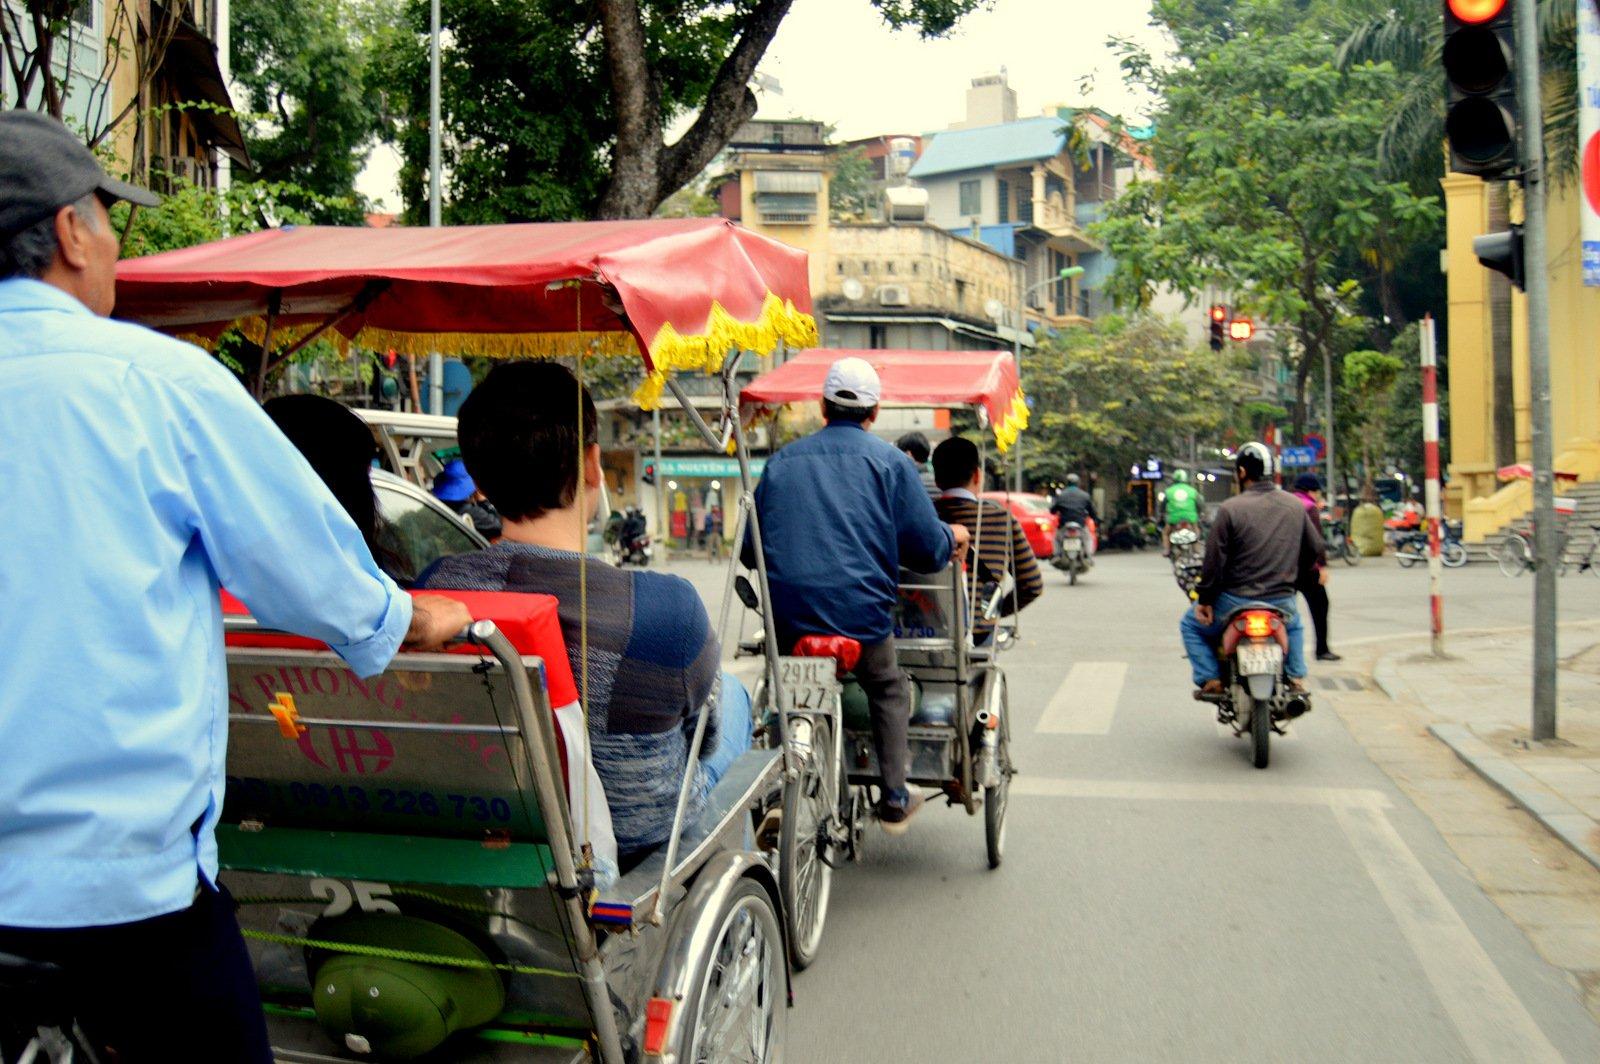 ВЬЕТНАМ, Ханой. Поездка на рикше и Театр Марионеток на Воде